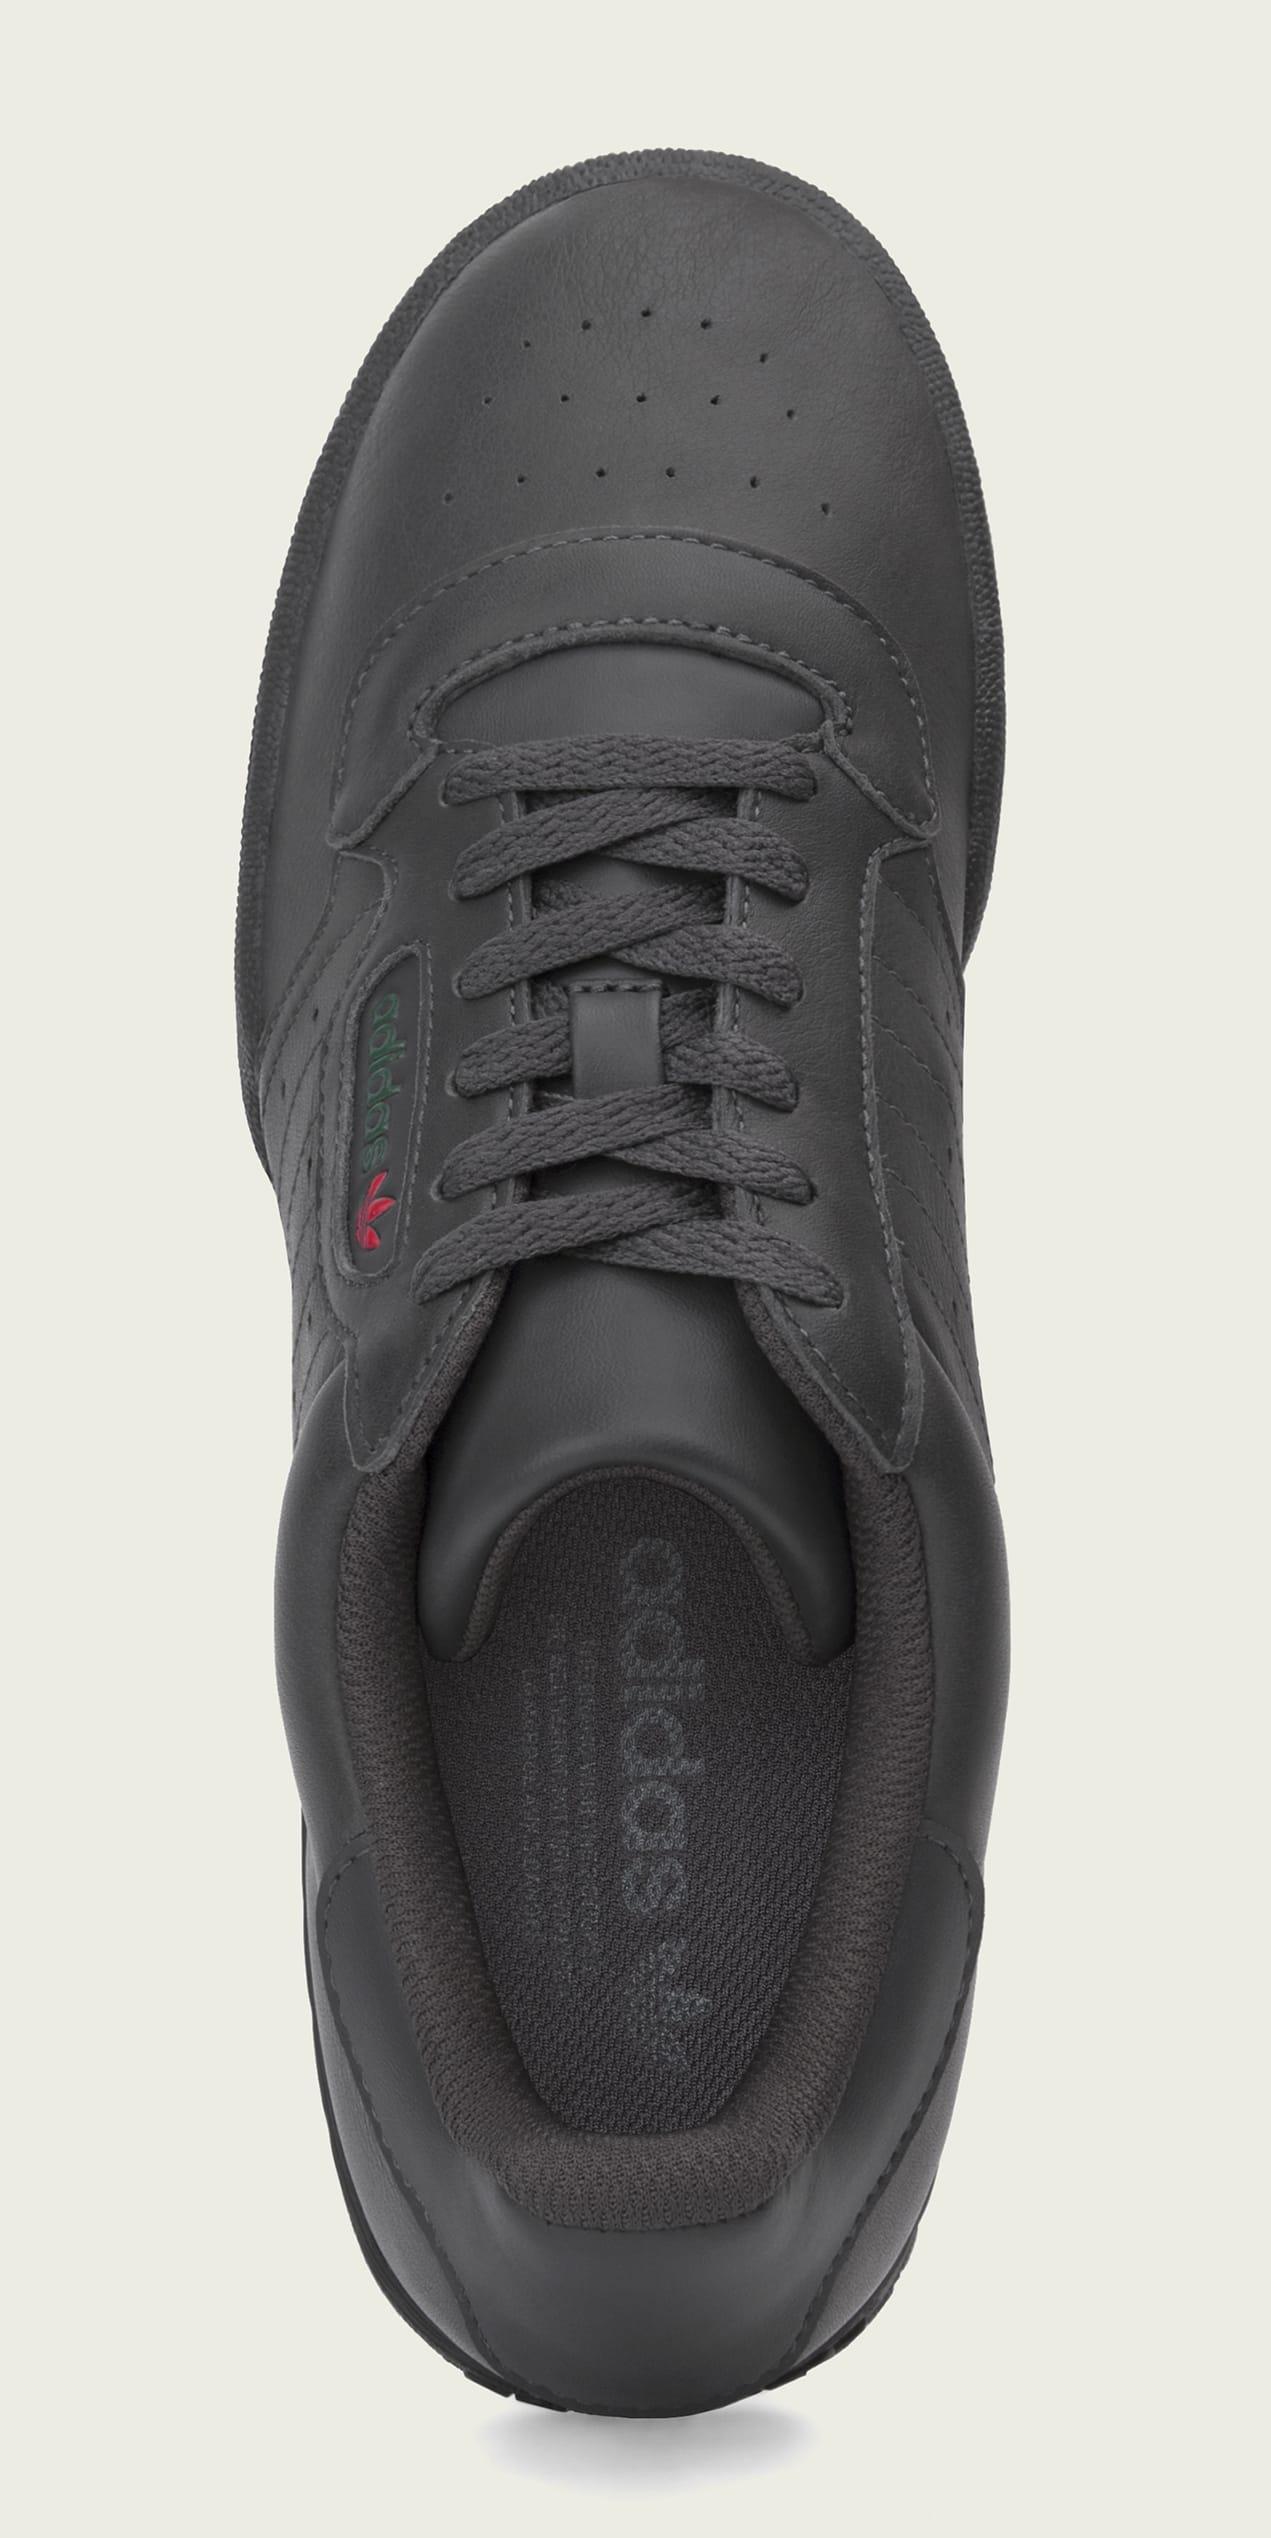 Adidas Yeezy Powerphase 'Core Black' CG6420 (Top)